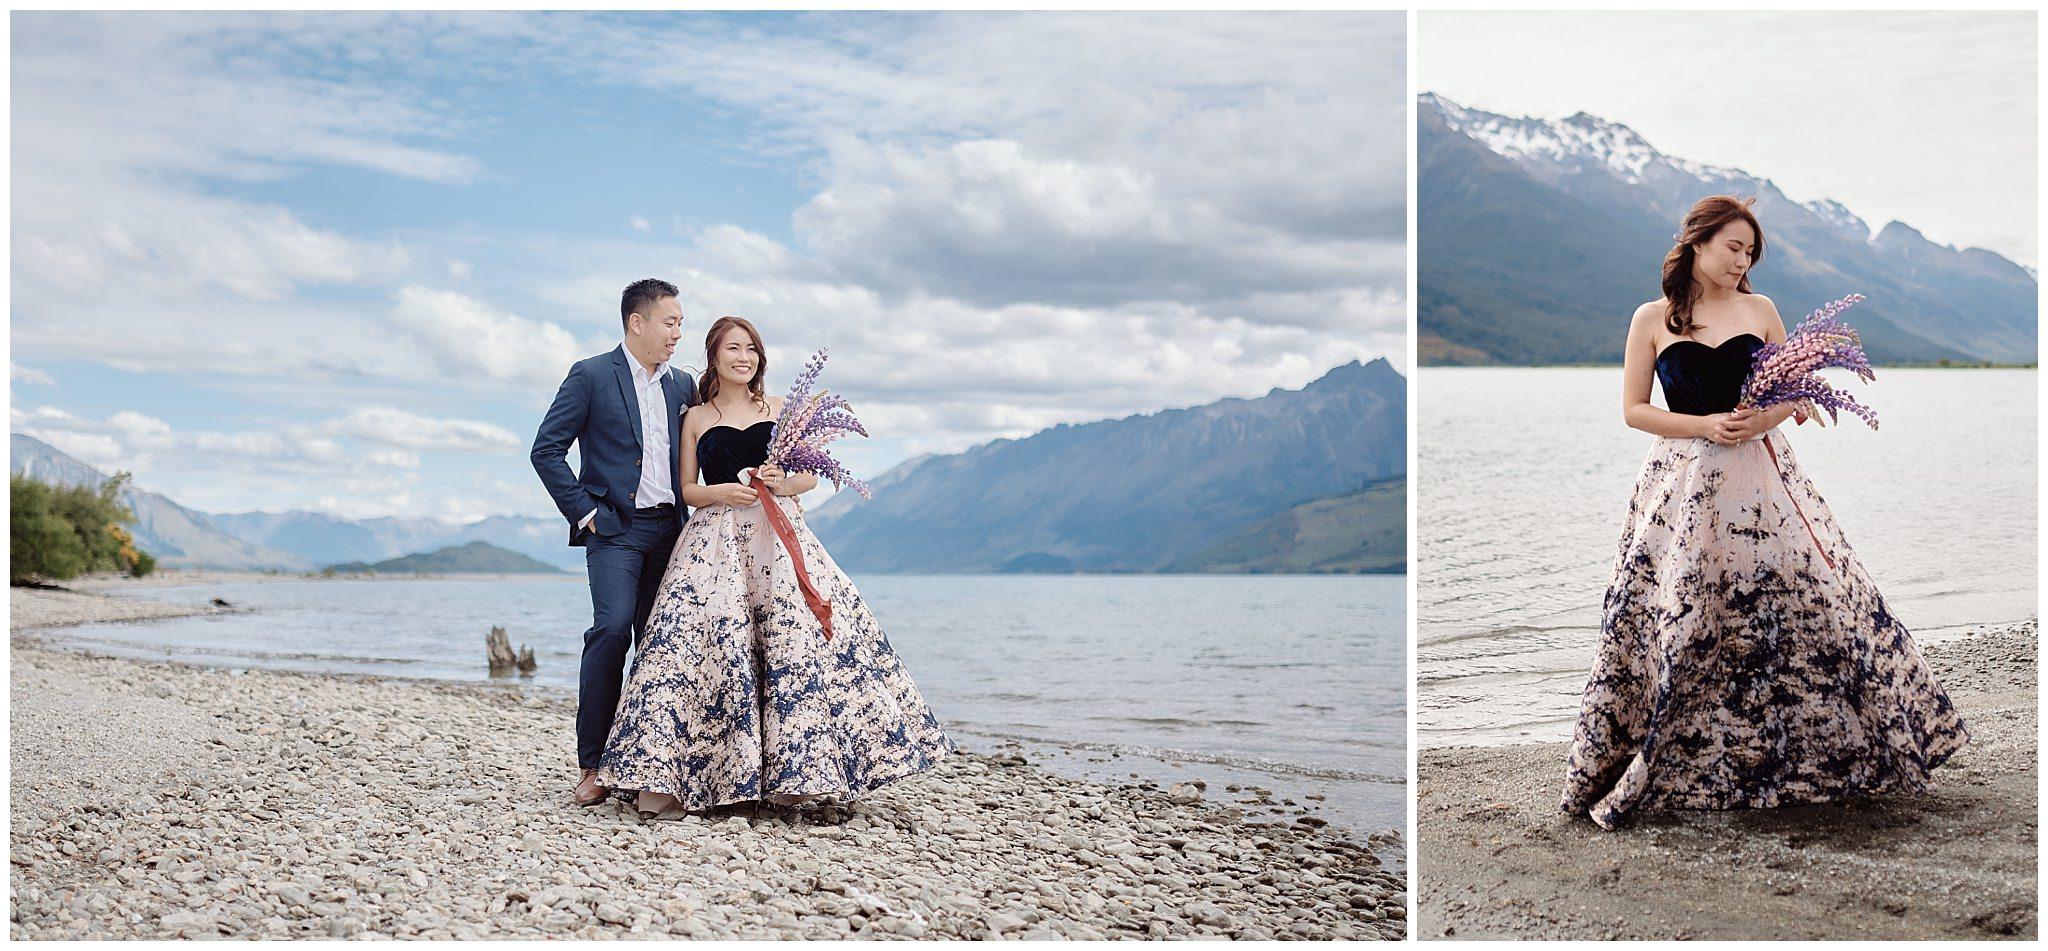 Queenstown New Zealand Prewedding Photographer_0060.jpg